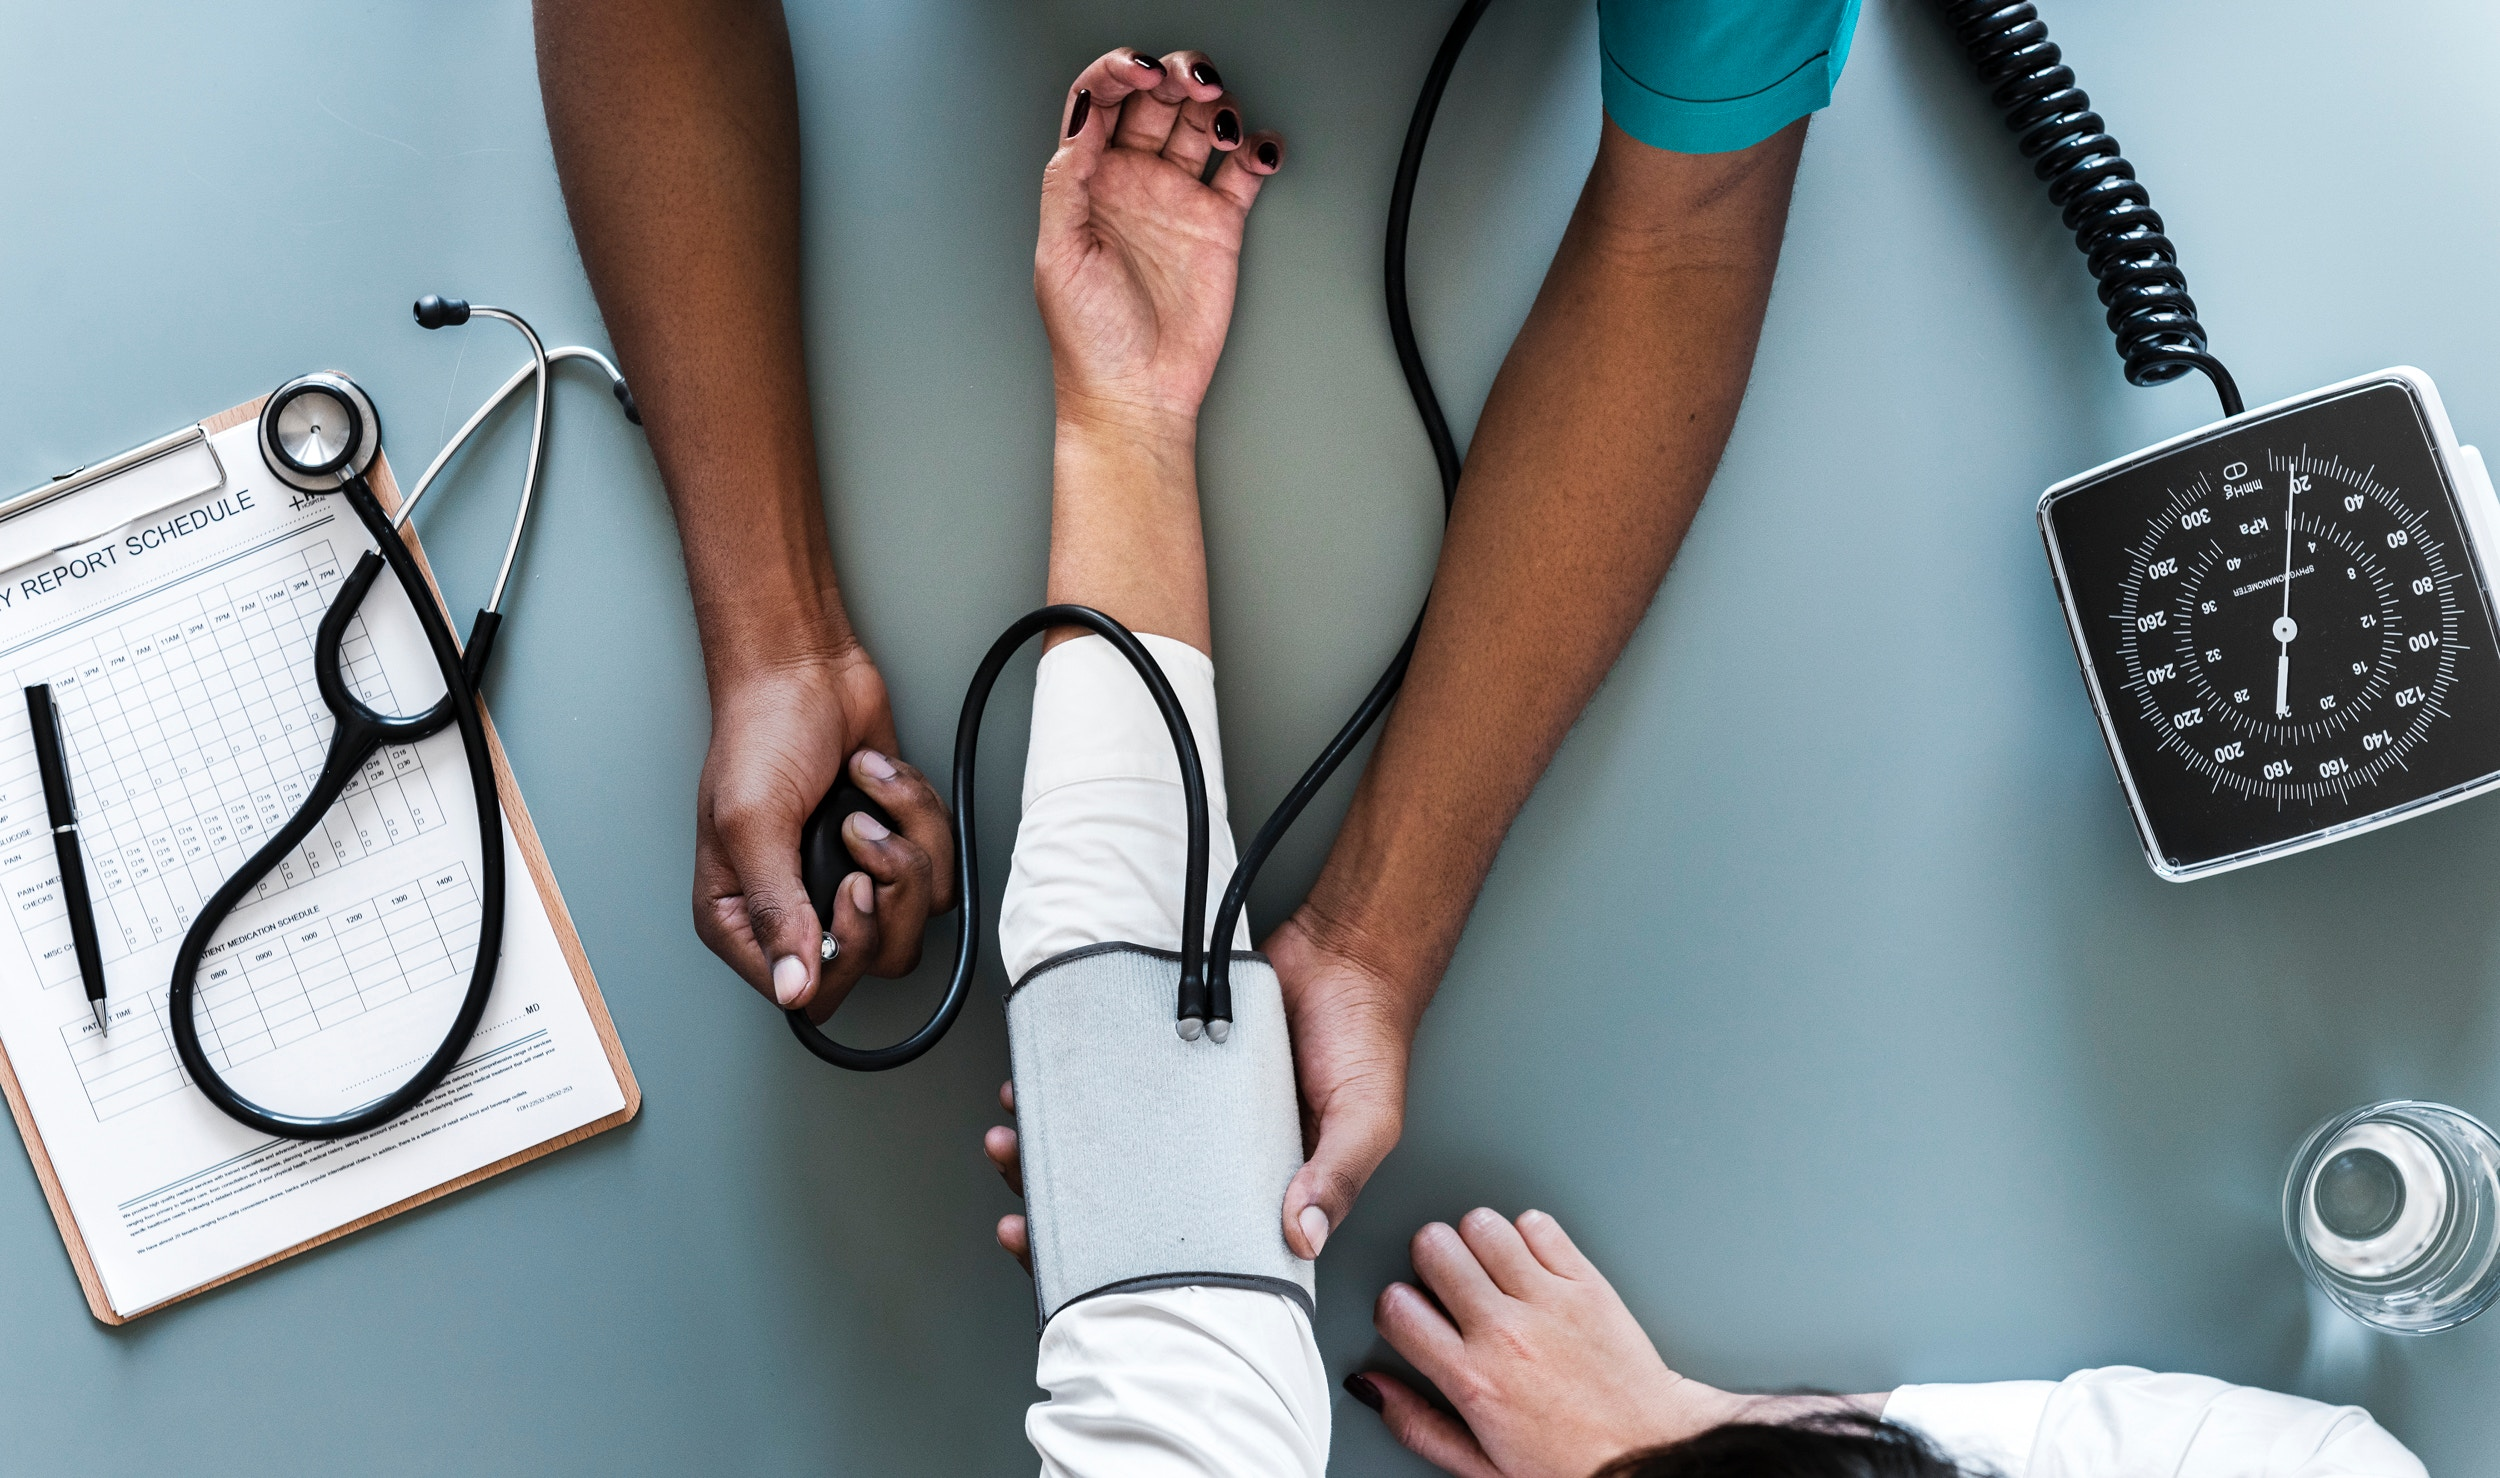 Australian health service